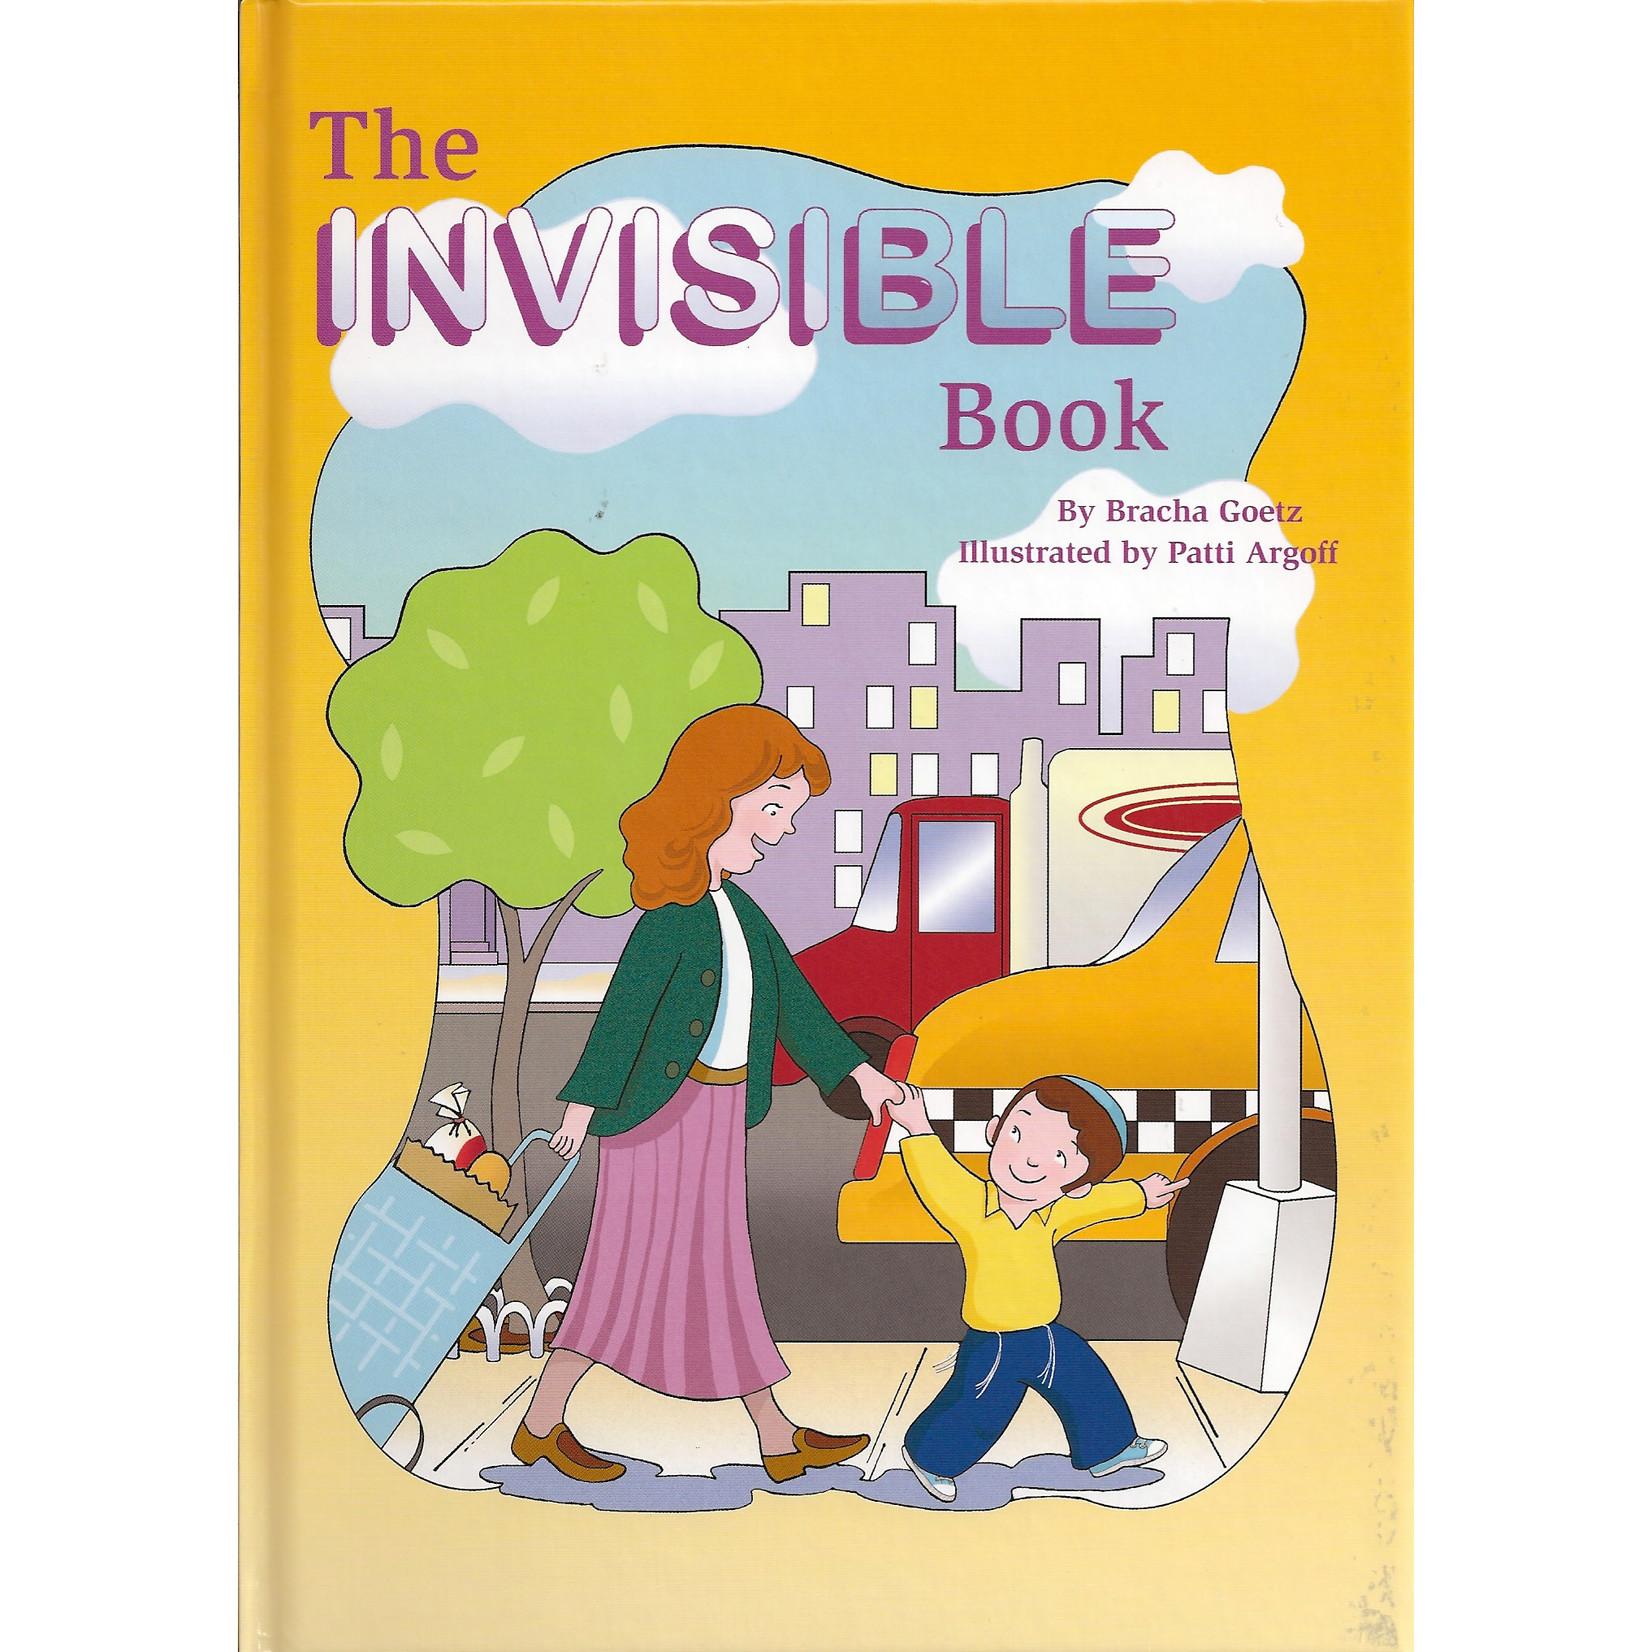 The Invisible Book